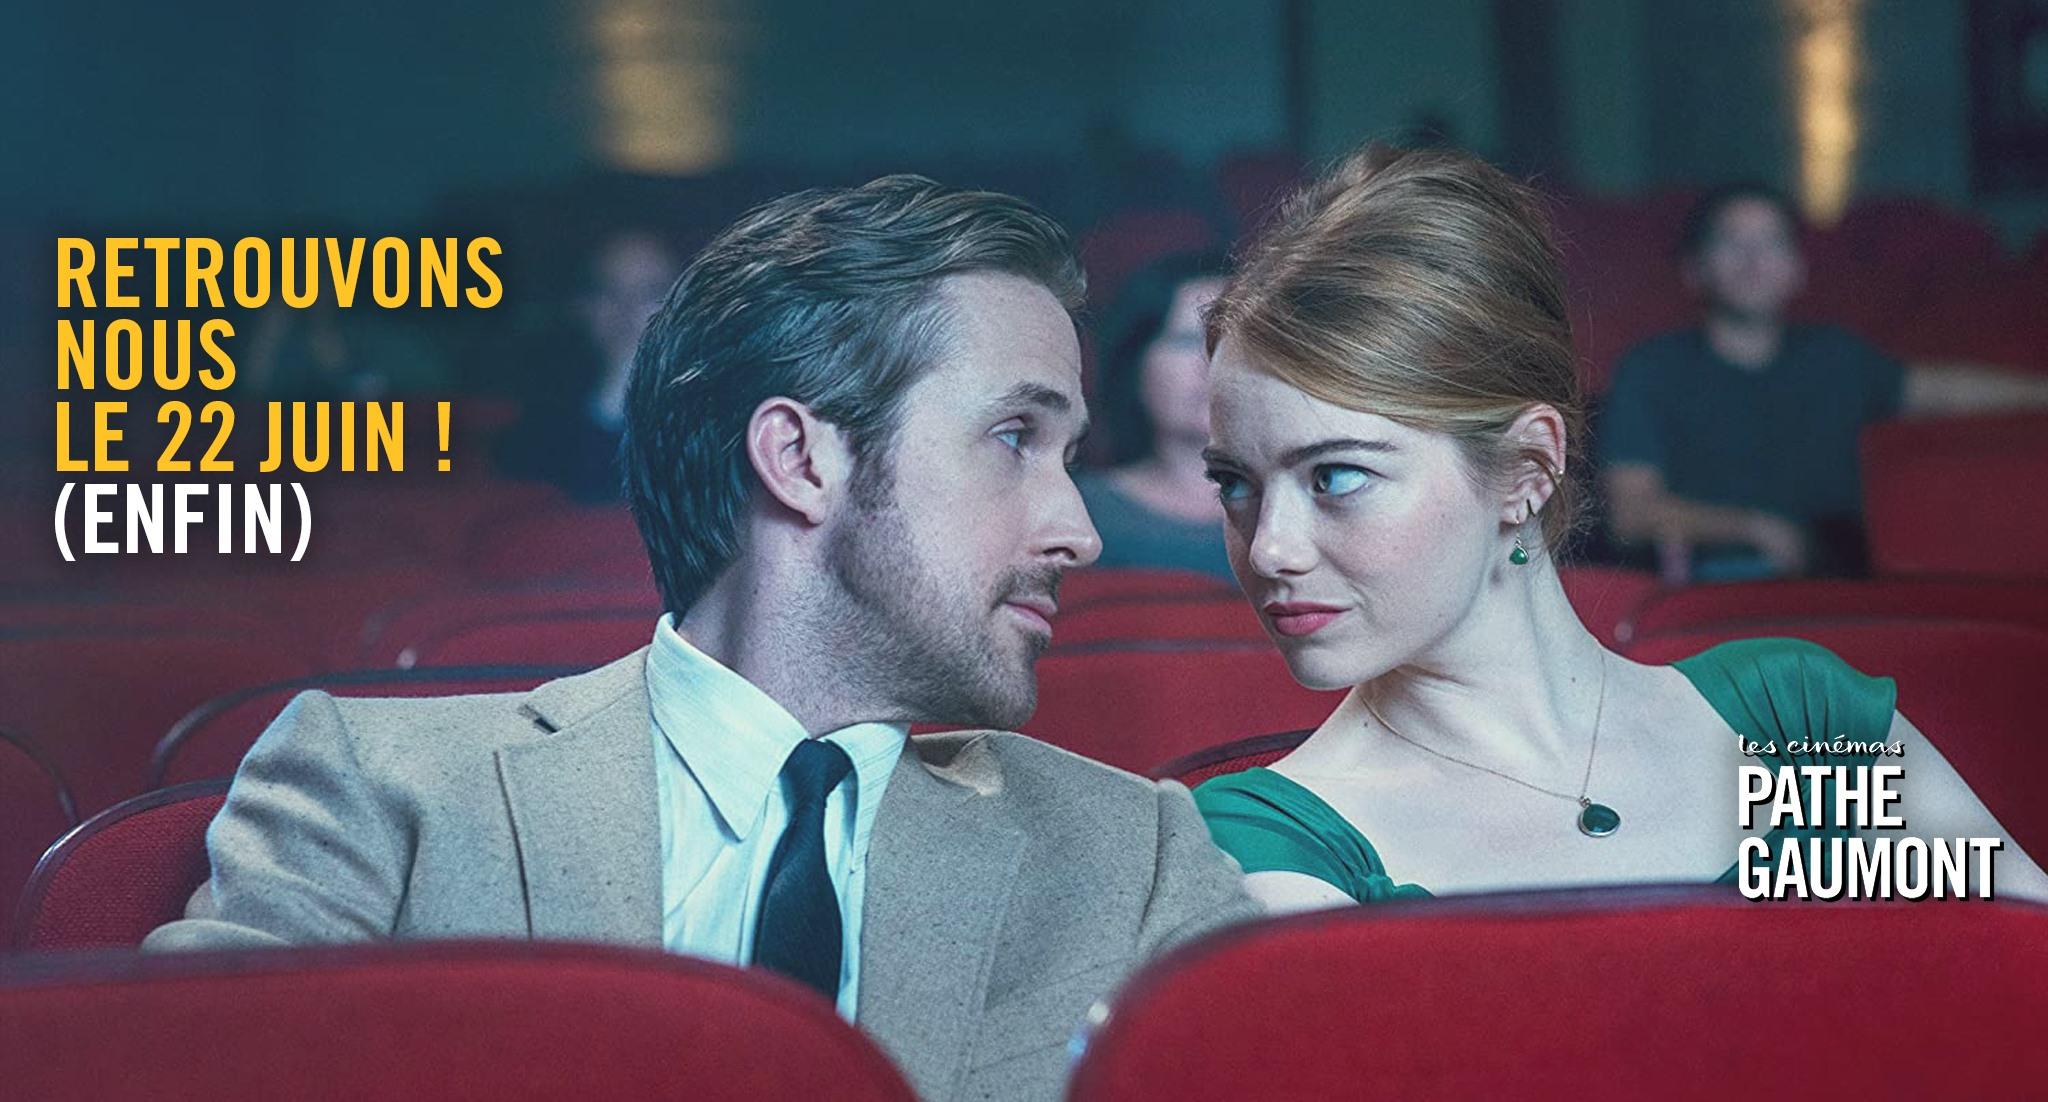 Reouverture cinemas Gaumont Pathe